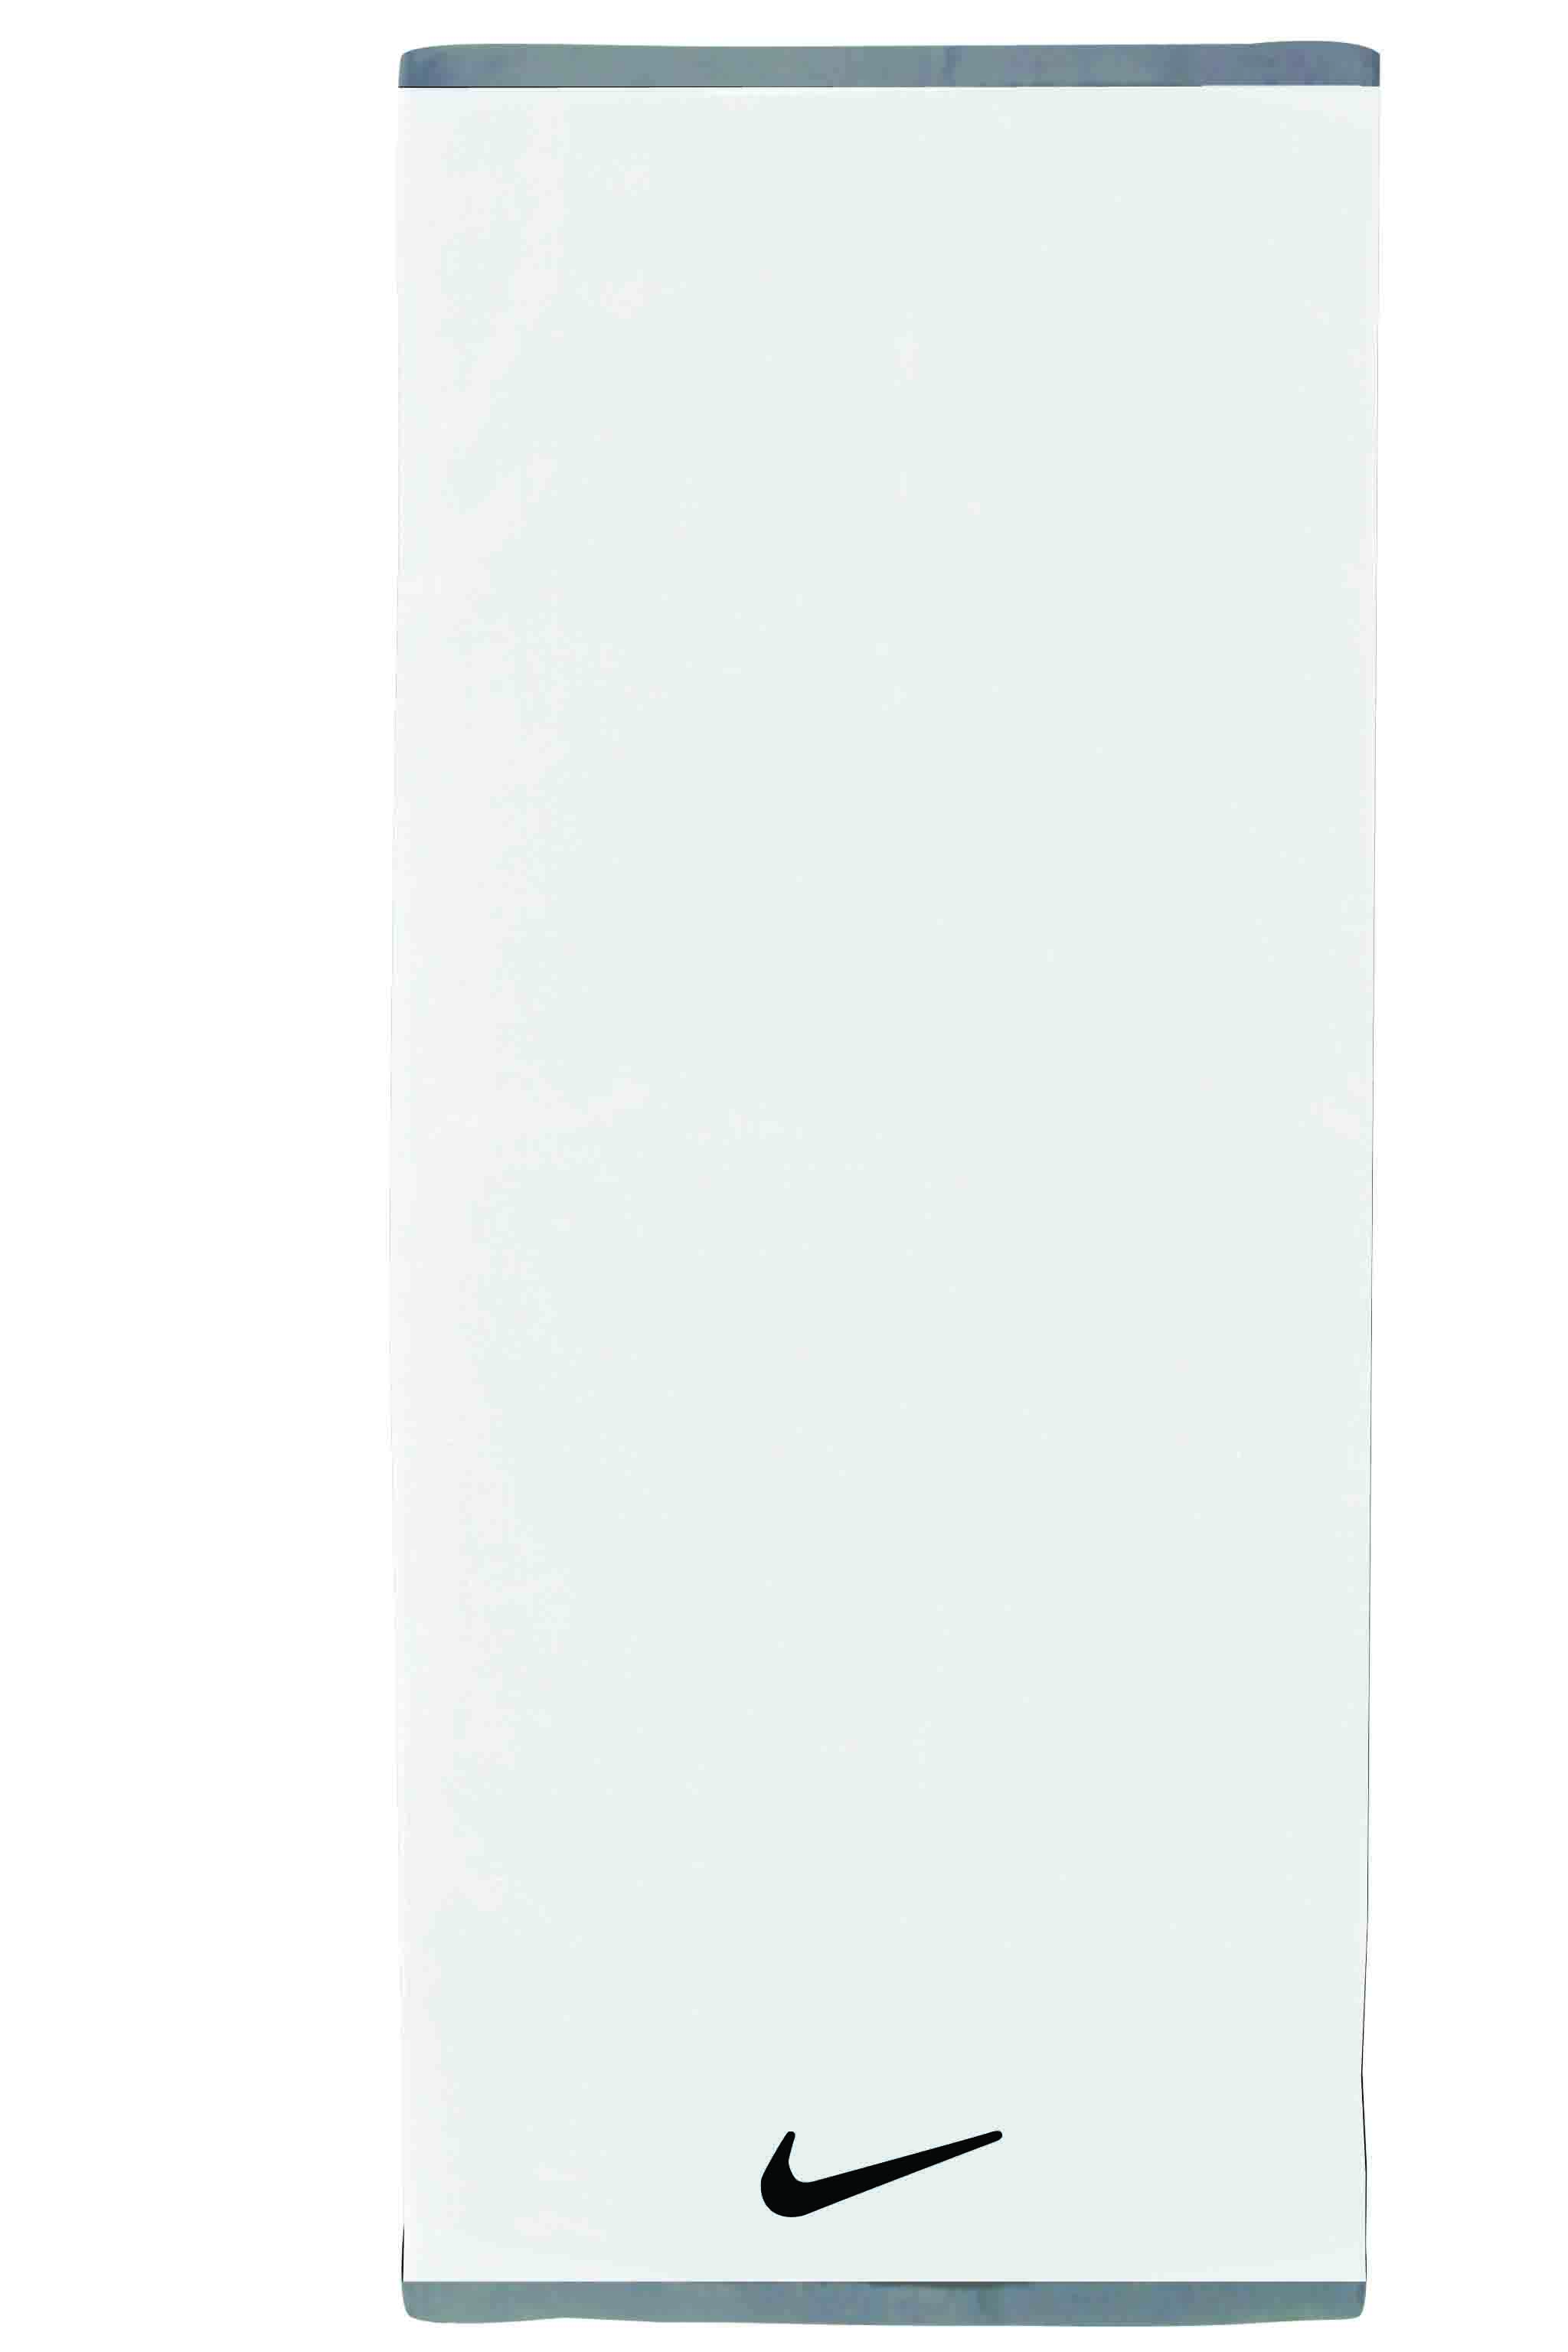 Nike Asciugamano Medio Bianco